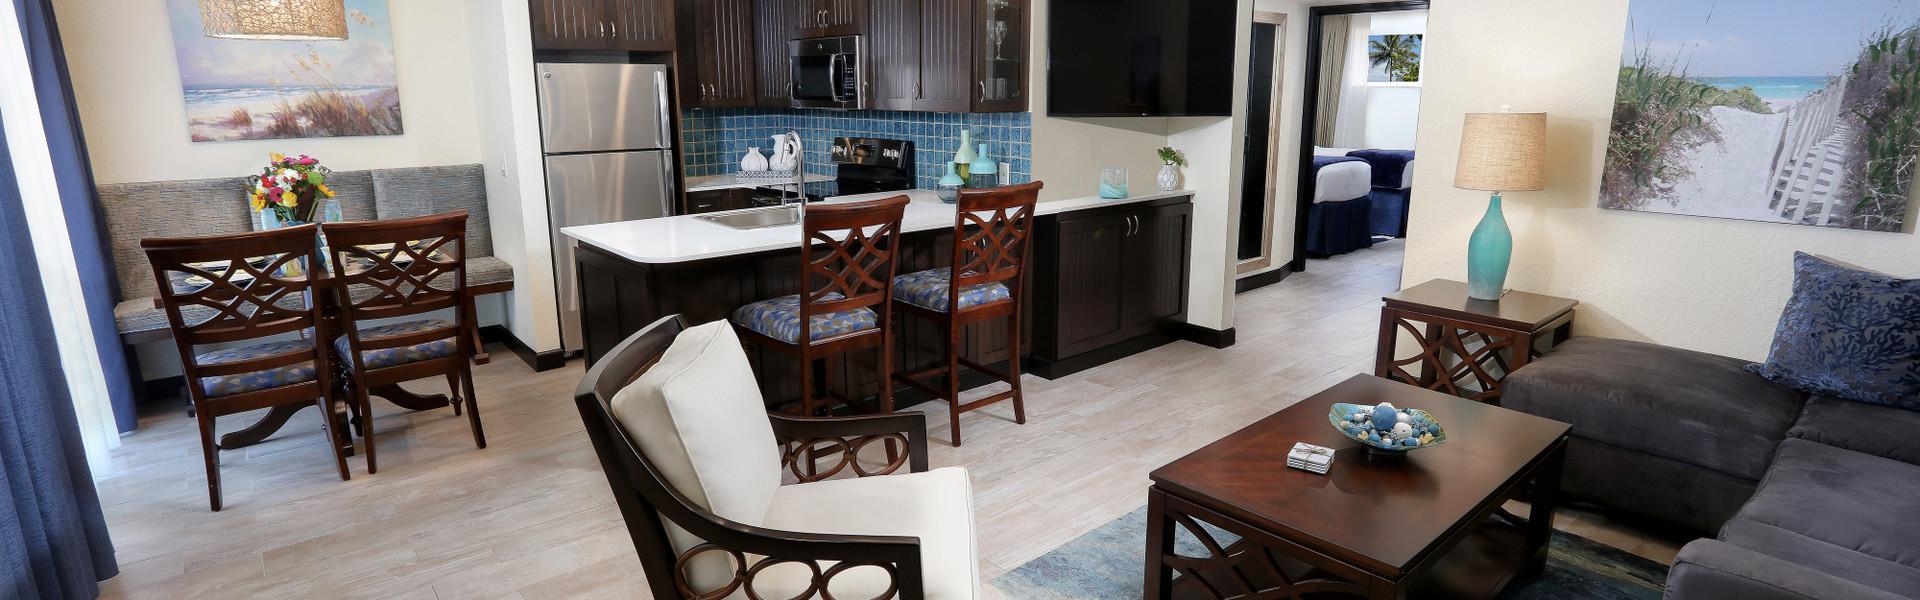 Signature Two Bedroom Suites in Cocoa Beach FL | Westgate Cocoa Beach Resort